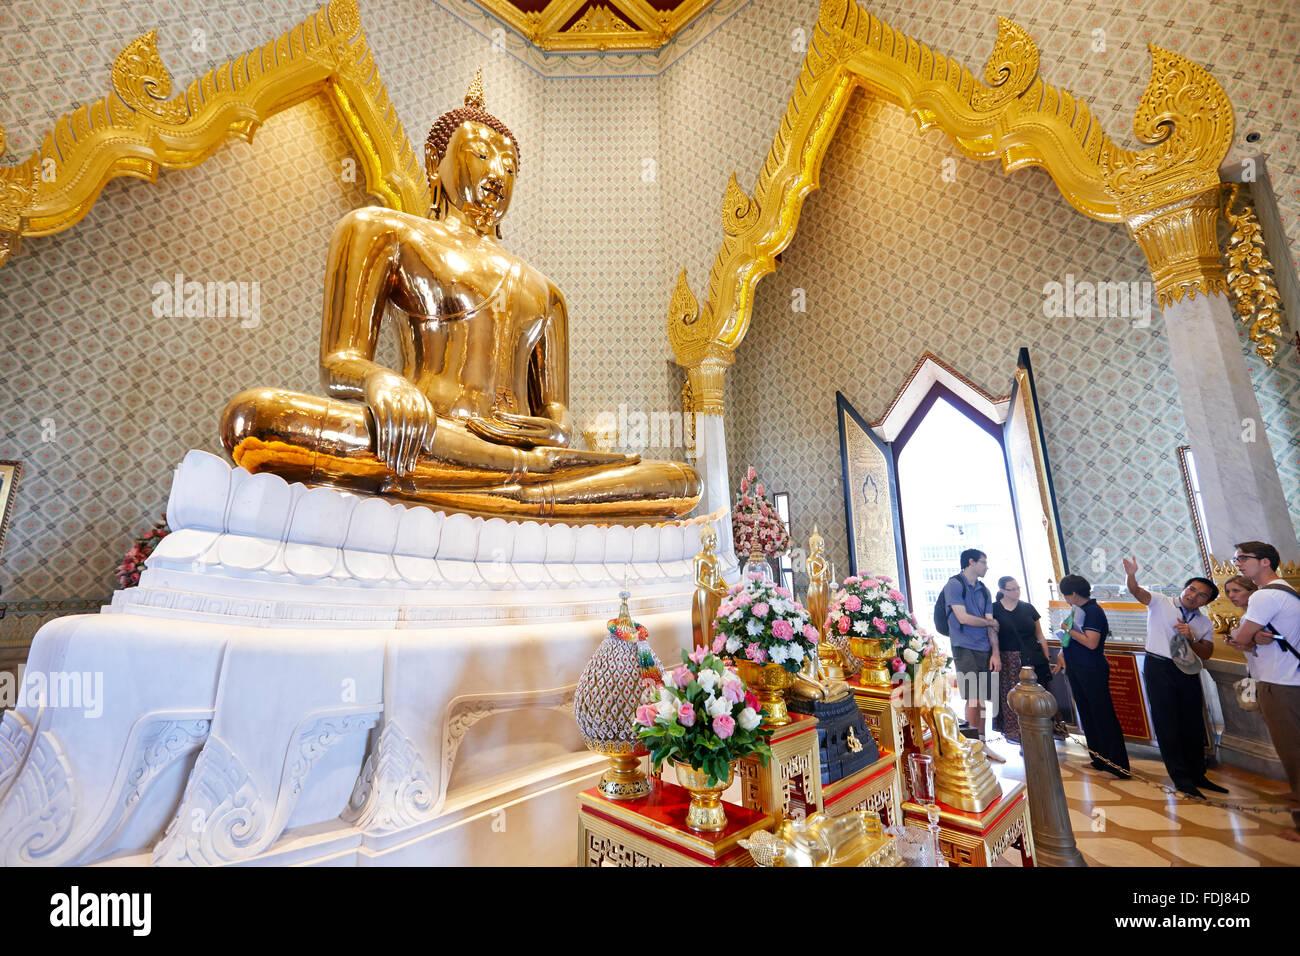 Image de Bouddha en or massif Wat Traimit Temple. Bangkok, Thaïlande. Photo Stock